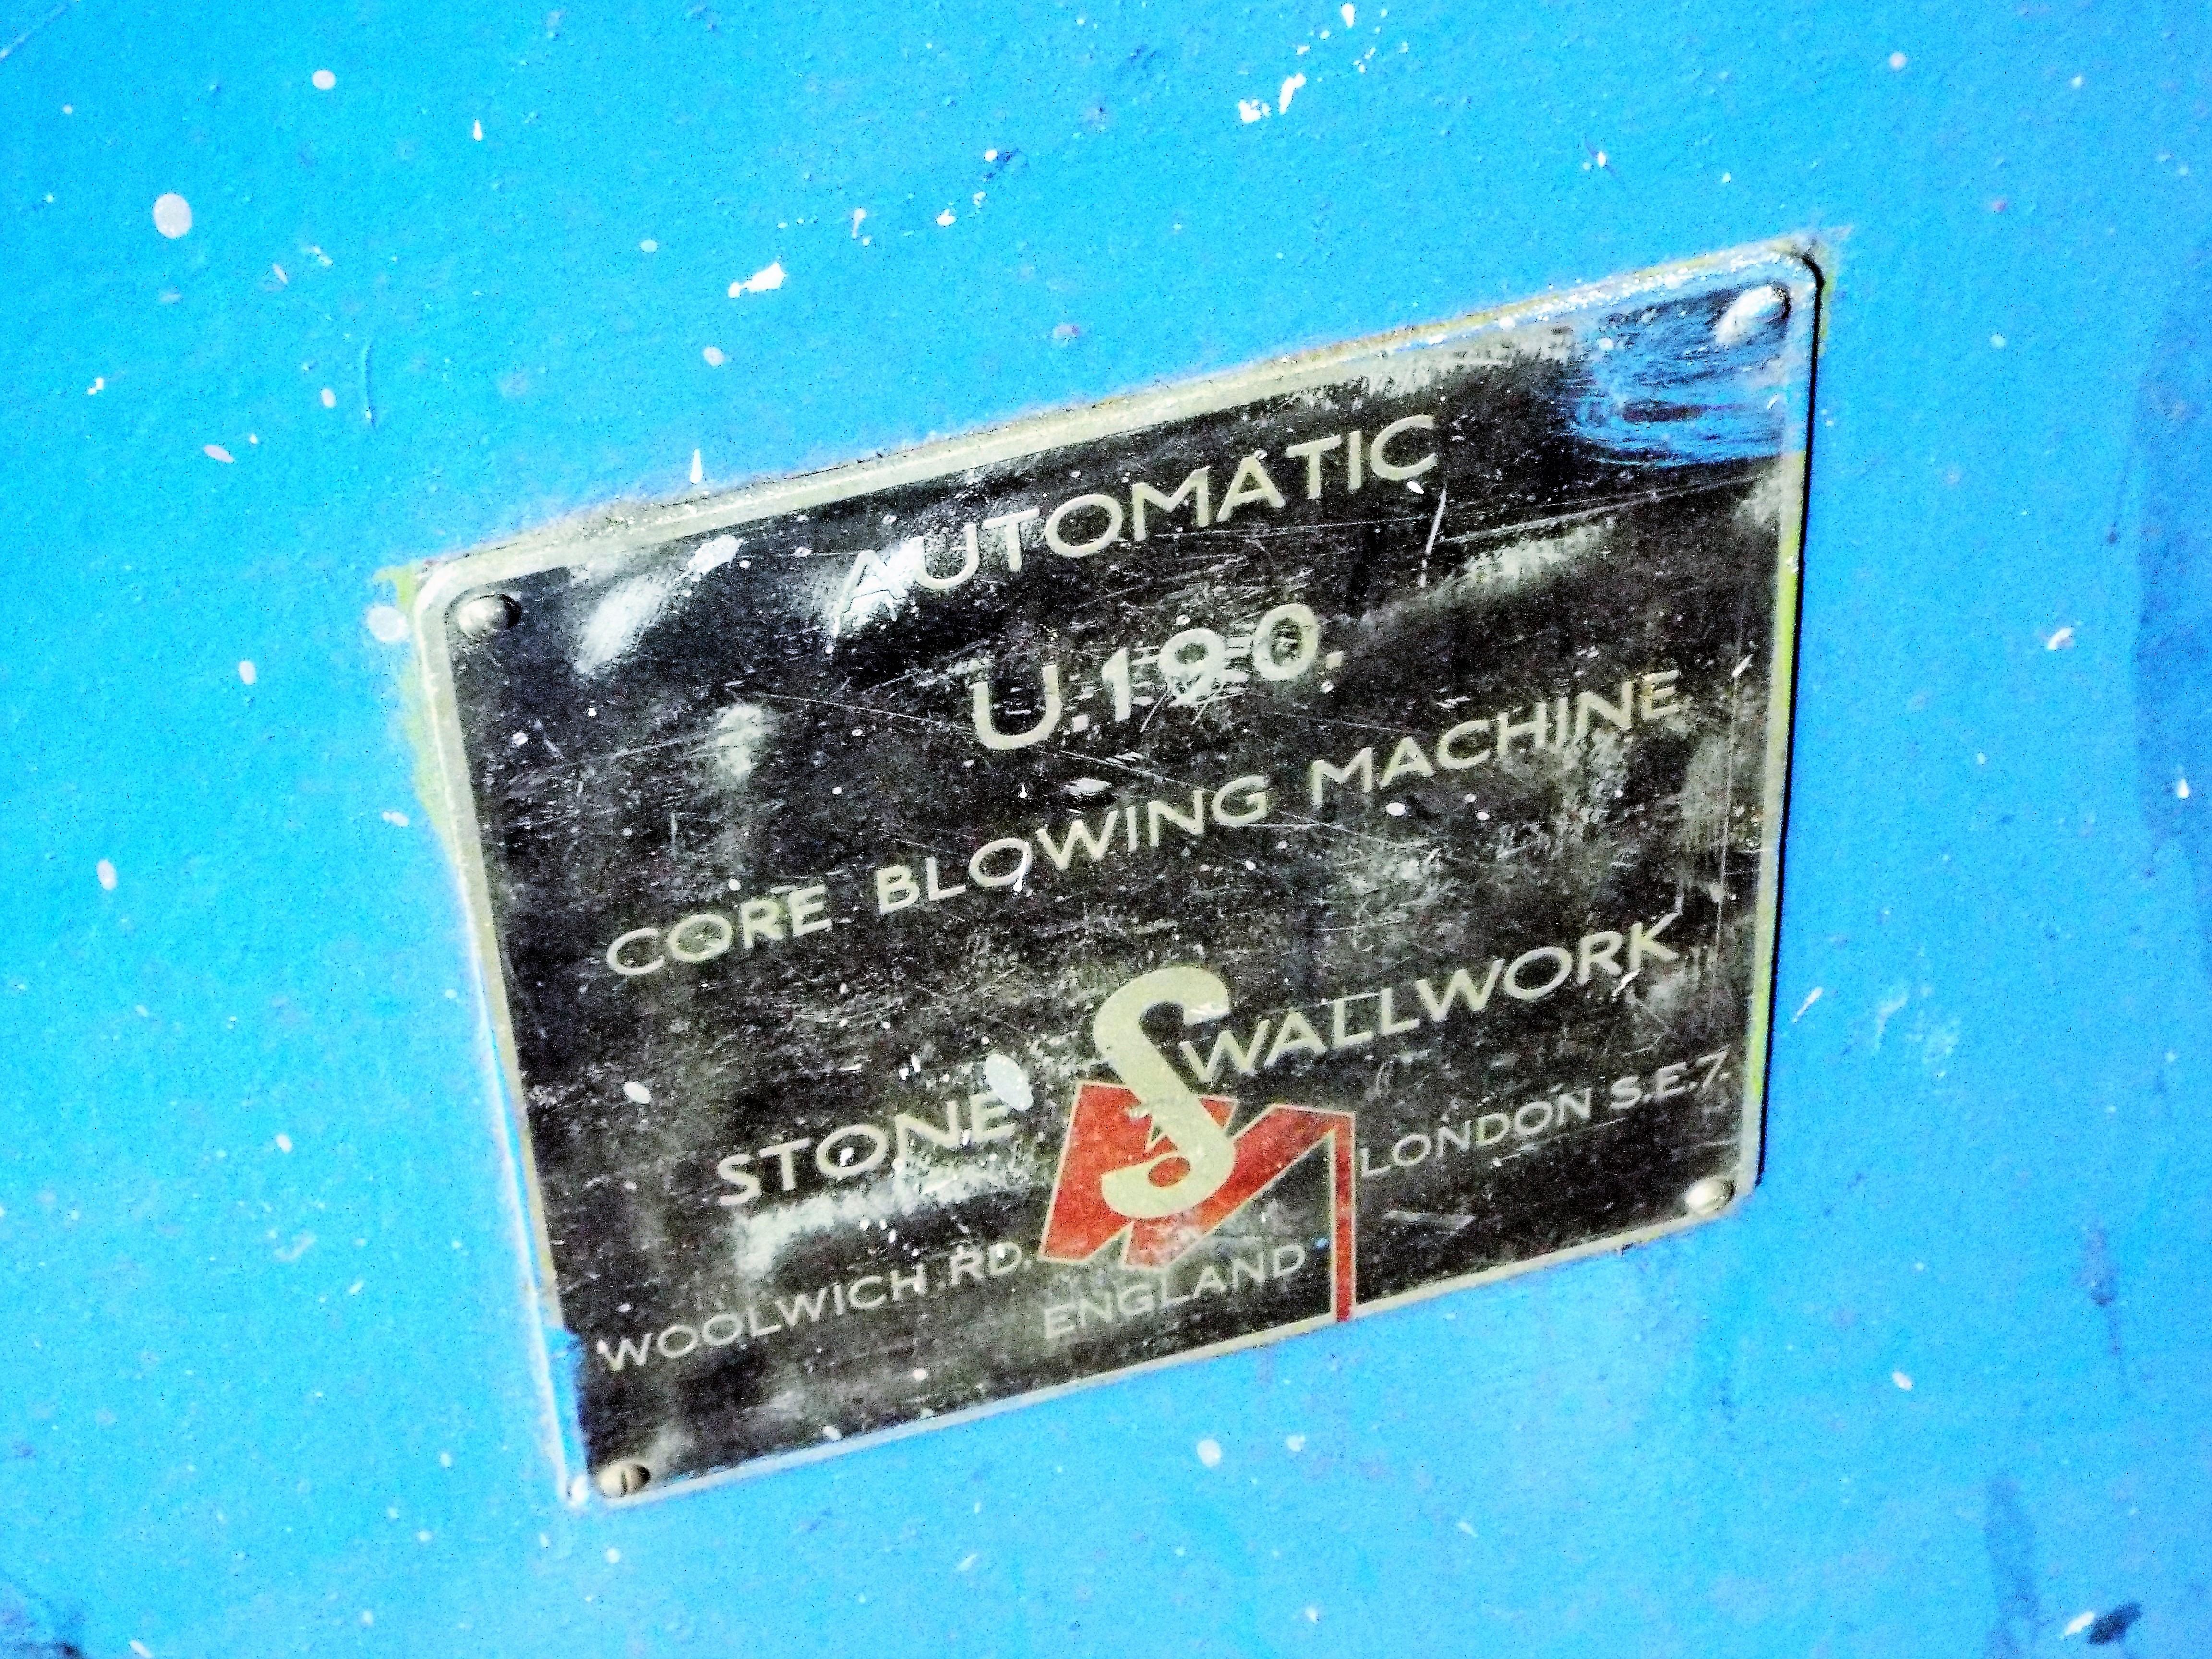 Lot 21 - Stone Wallwork Core Blower